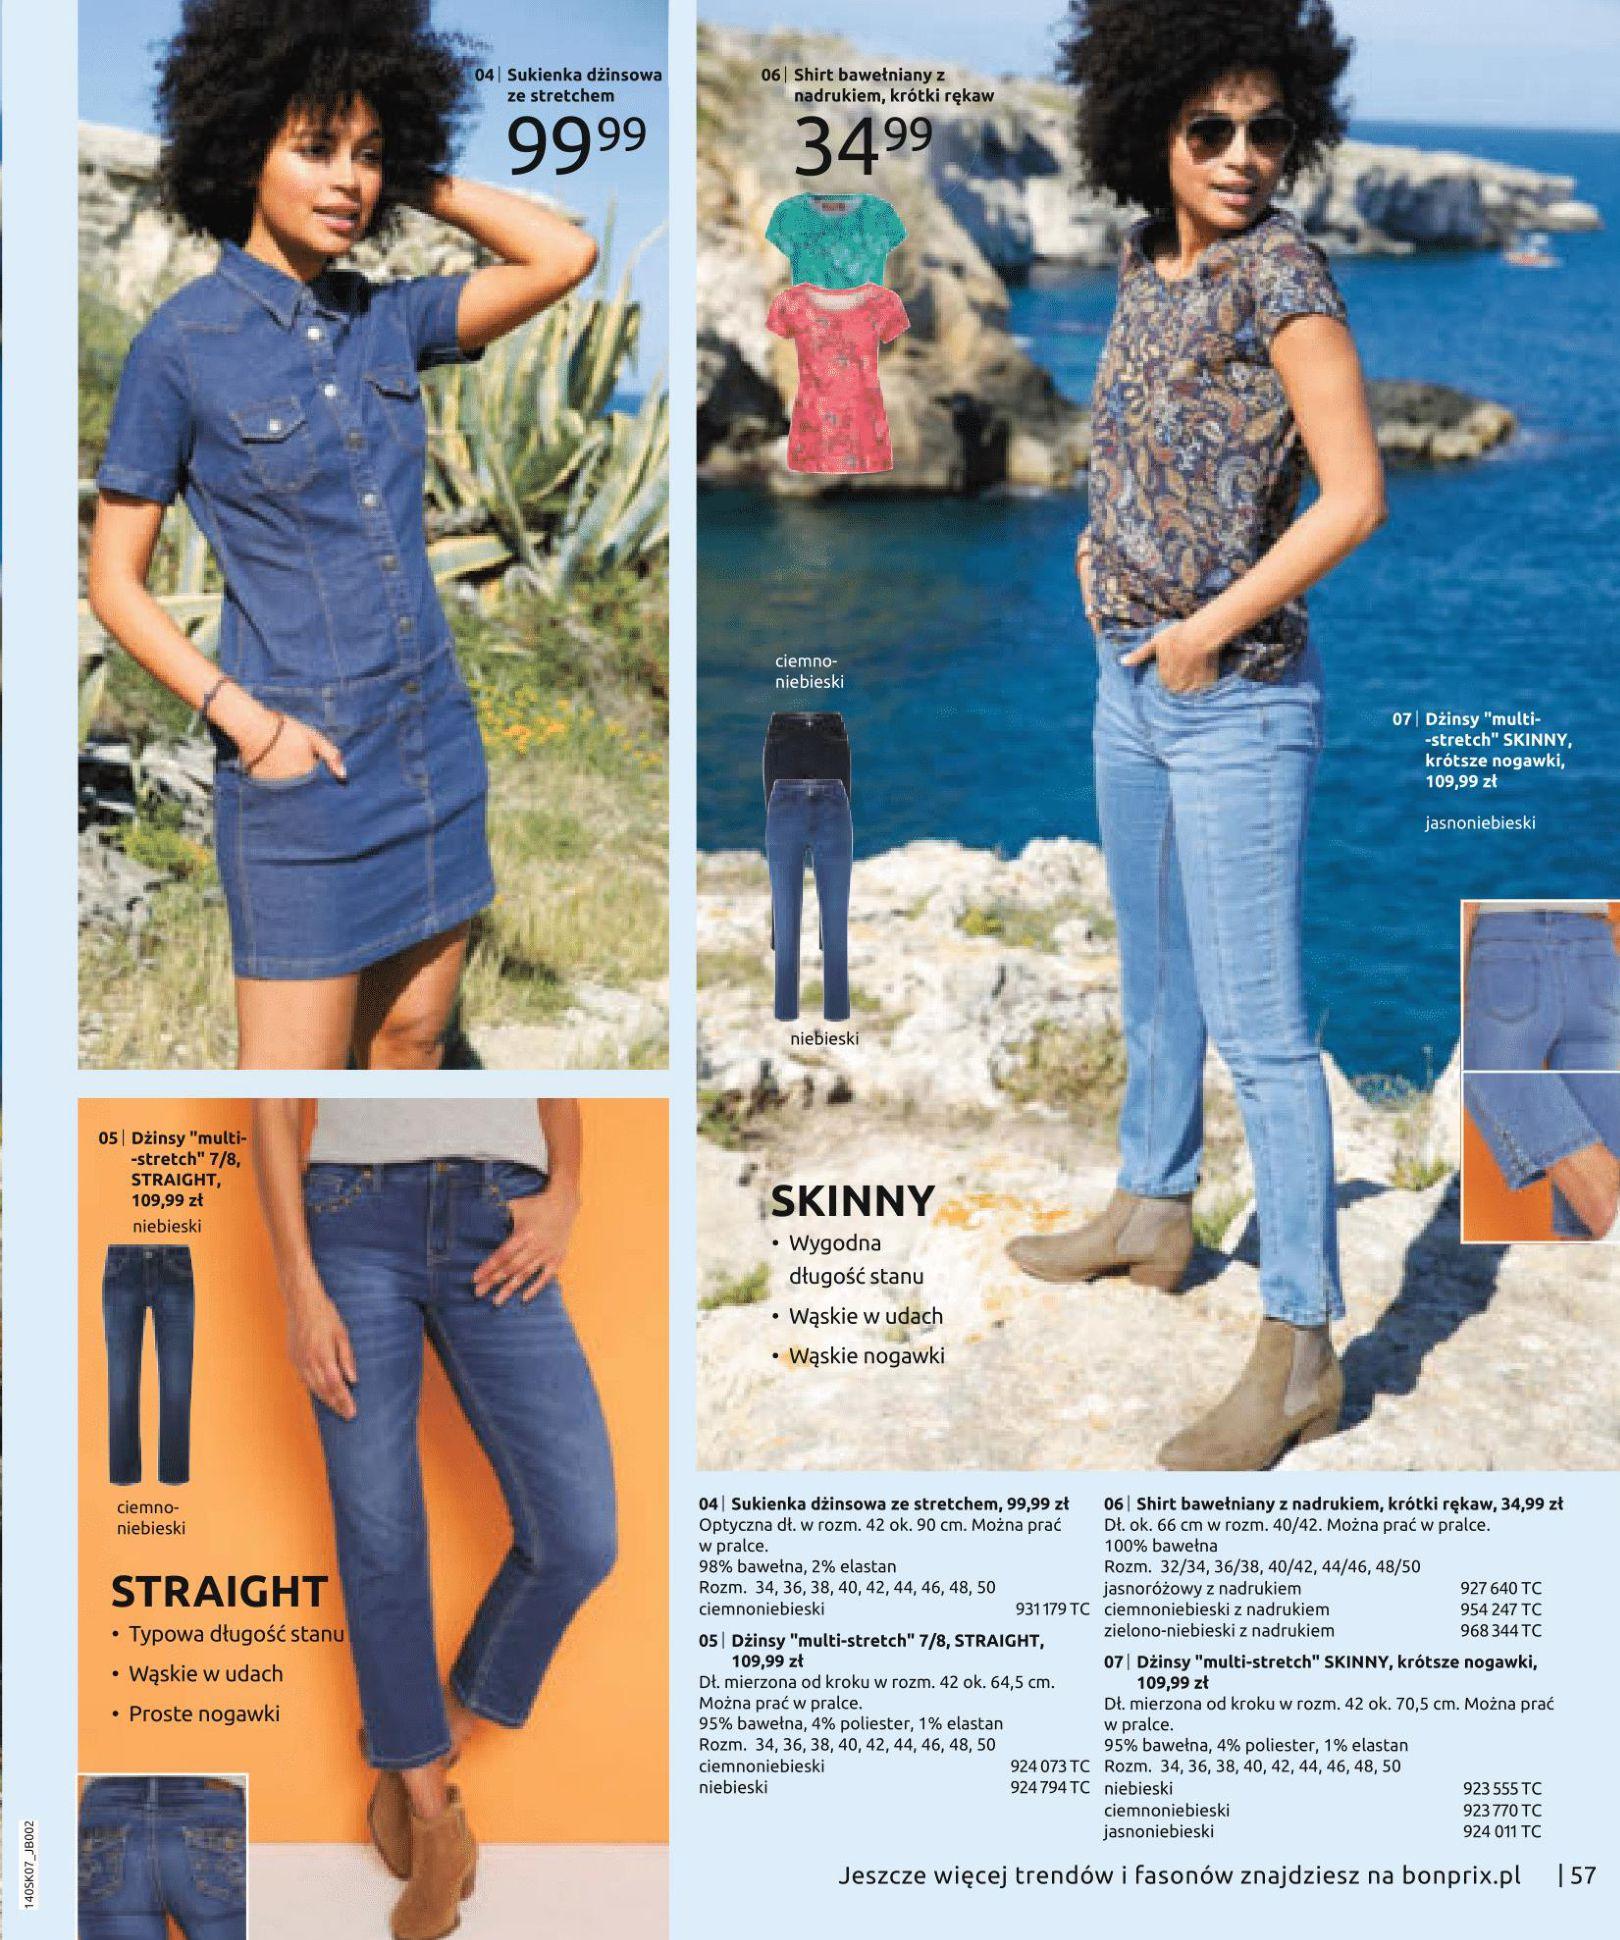 Gazetka Bonprix - Letnie trendy-02.07.2019-15.01.2020-page-